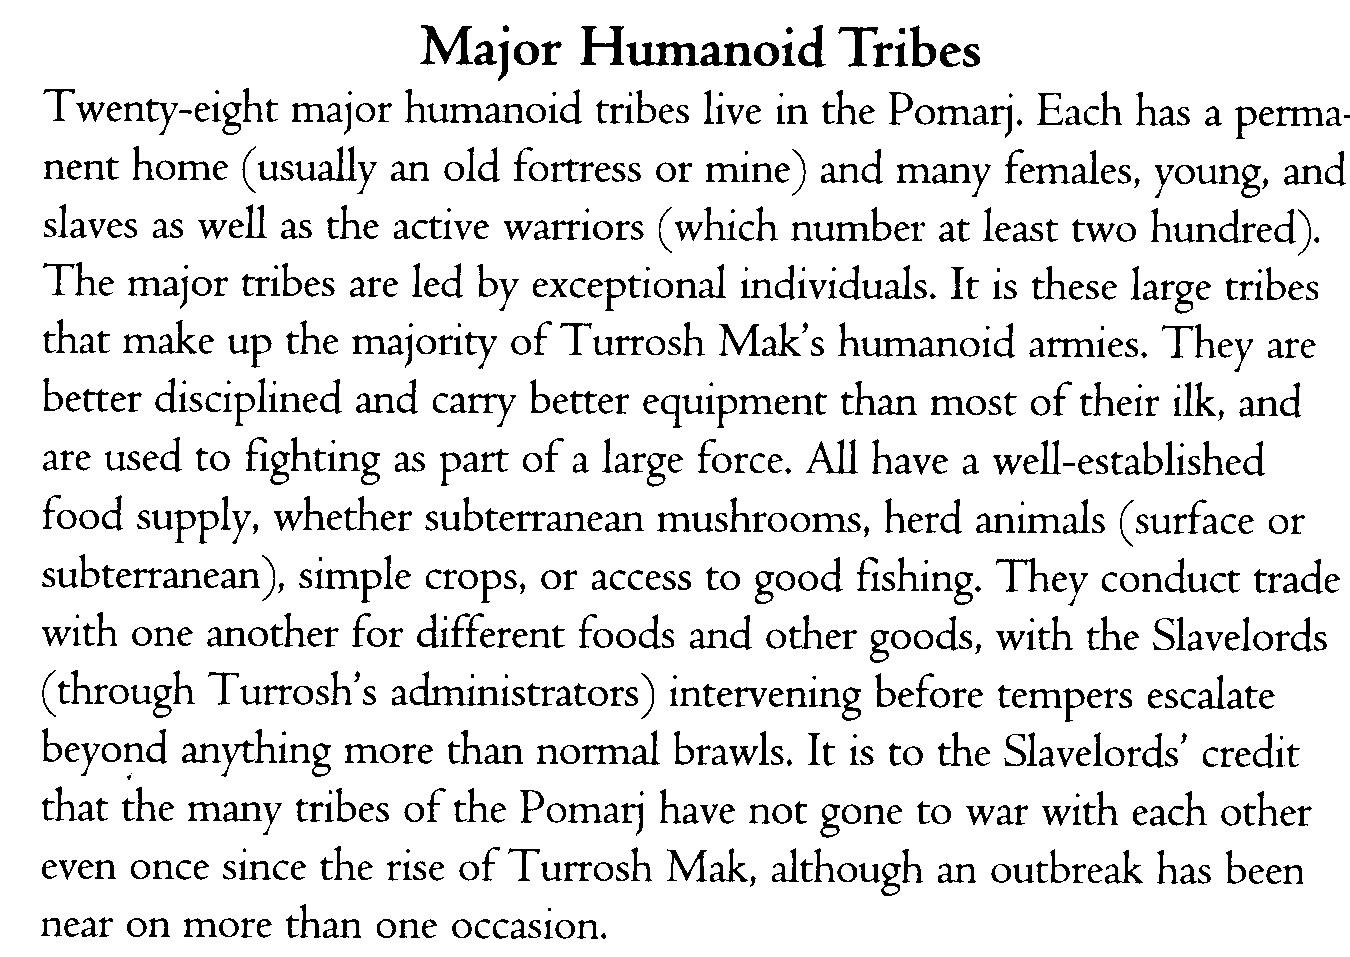 Pomarj tribes